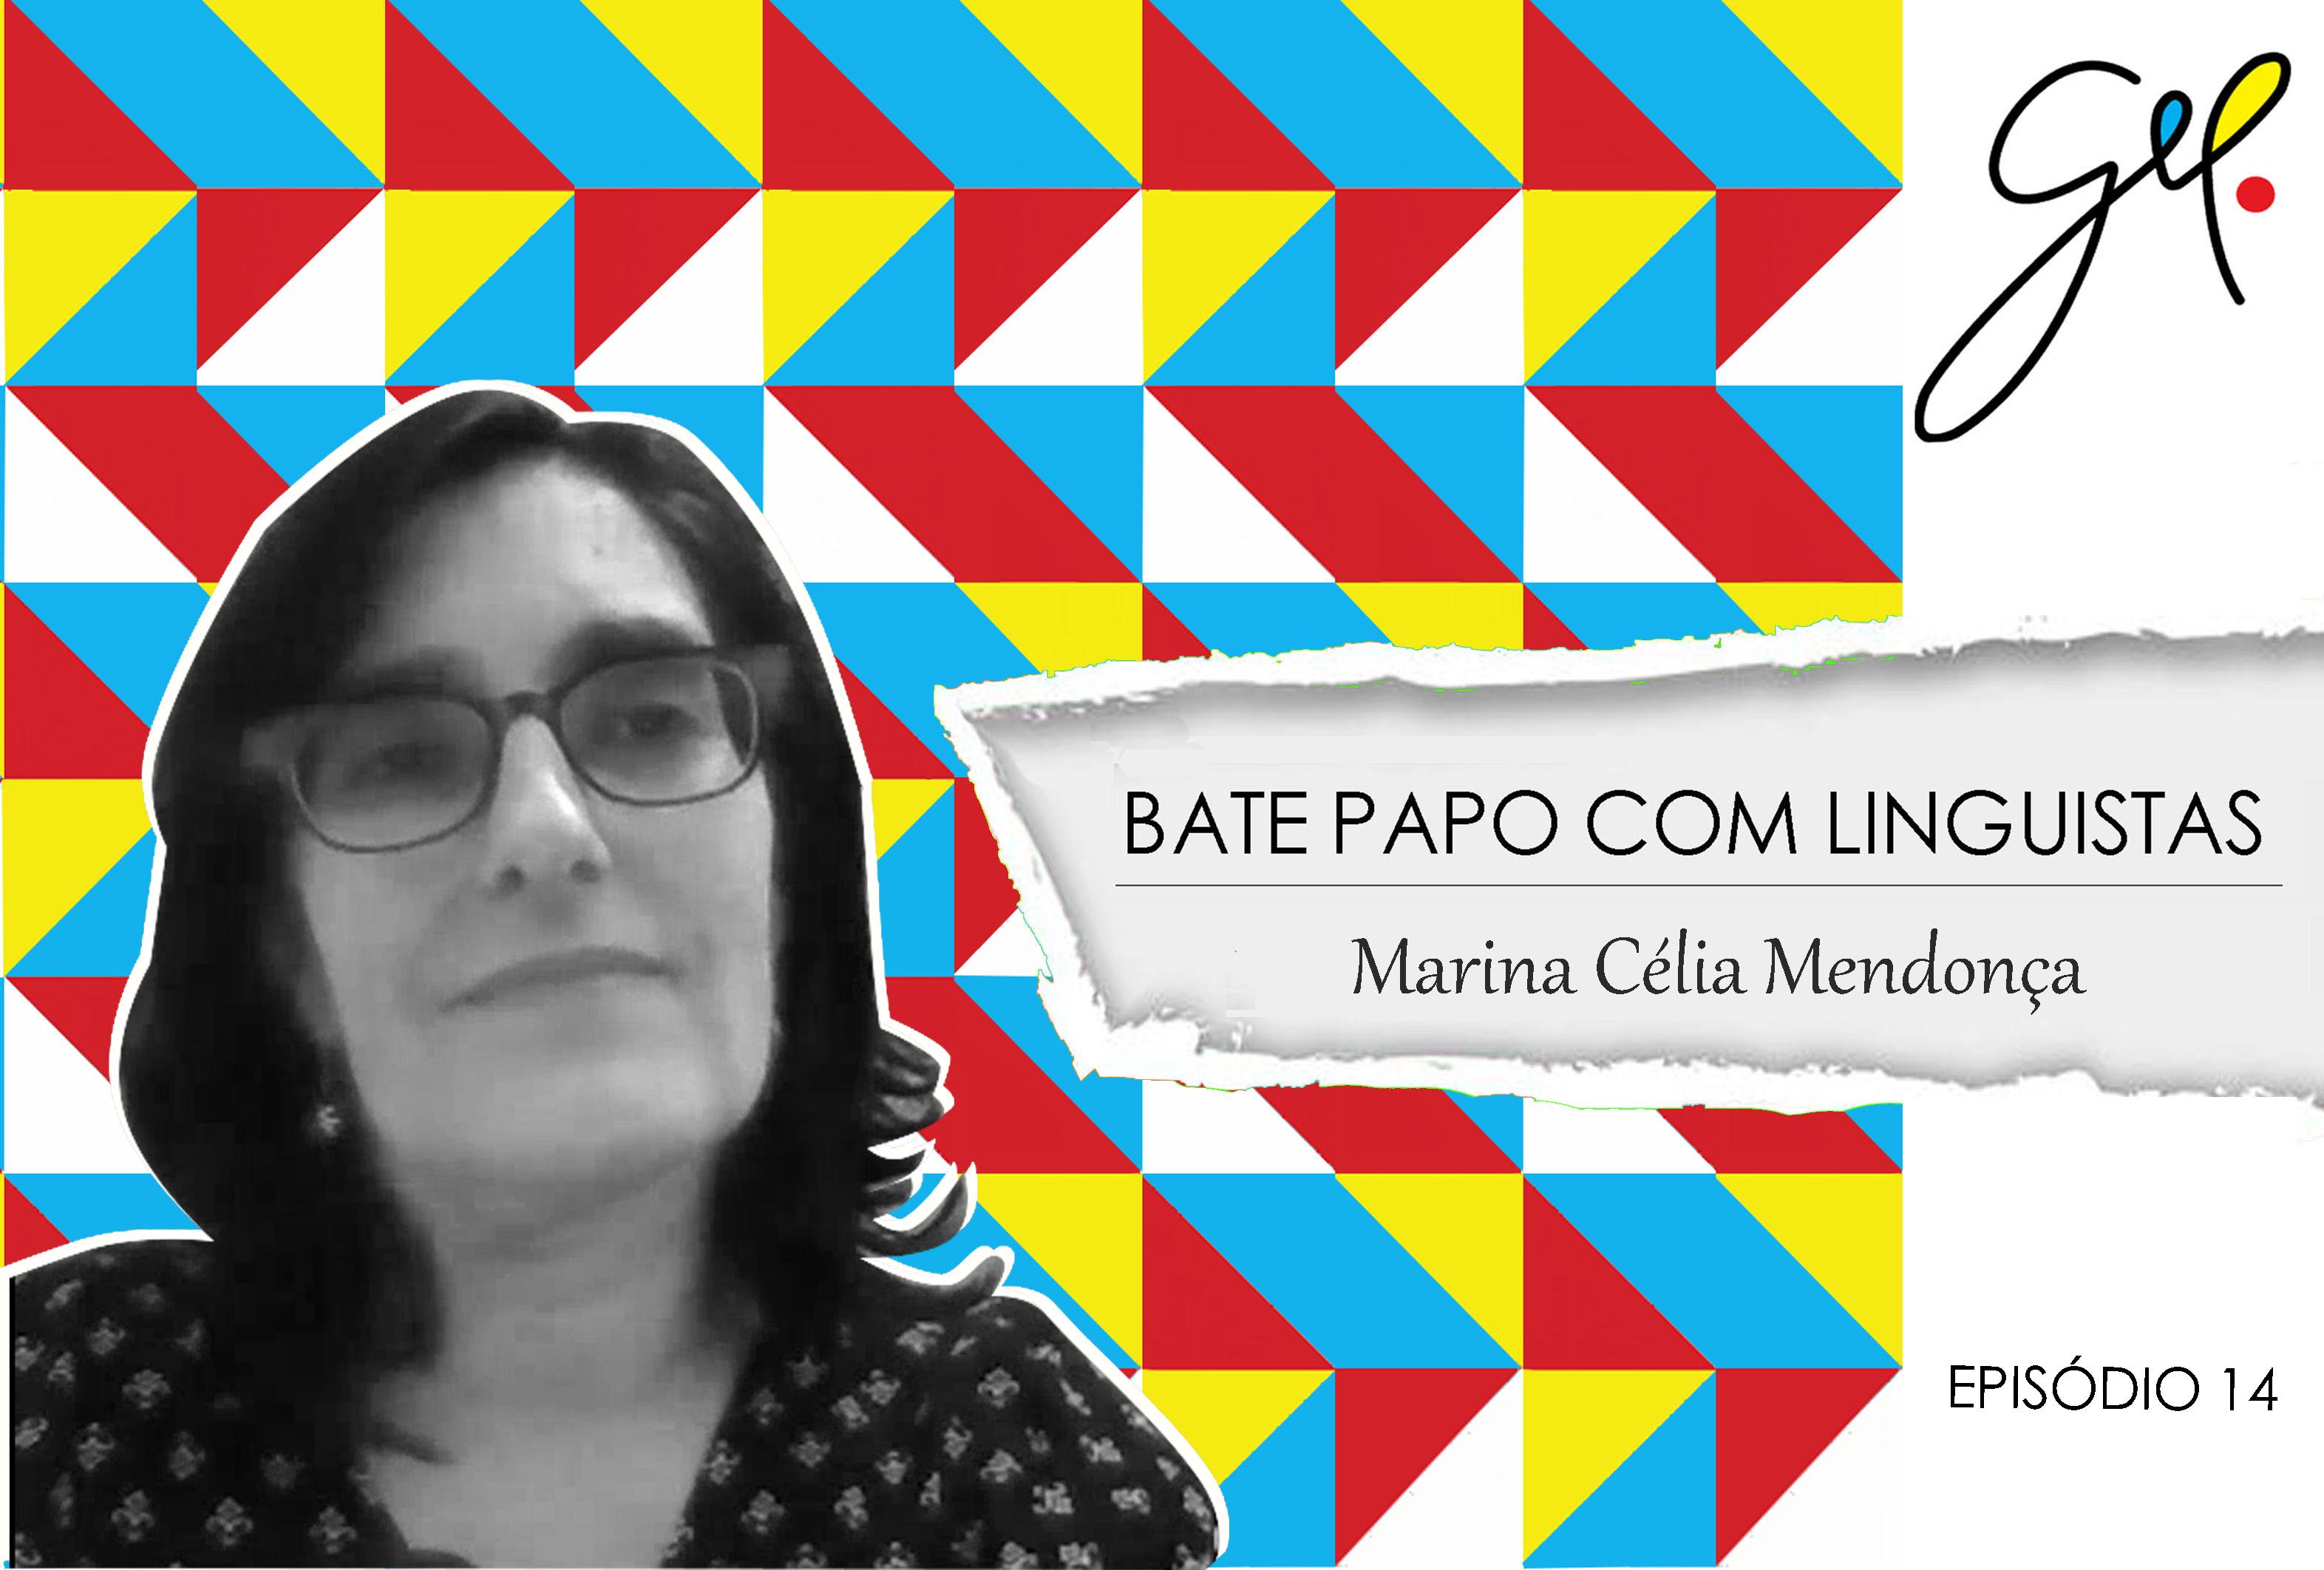 EP 14 | Conversa com Marina Célia Mendonça